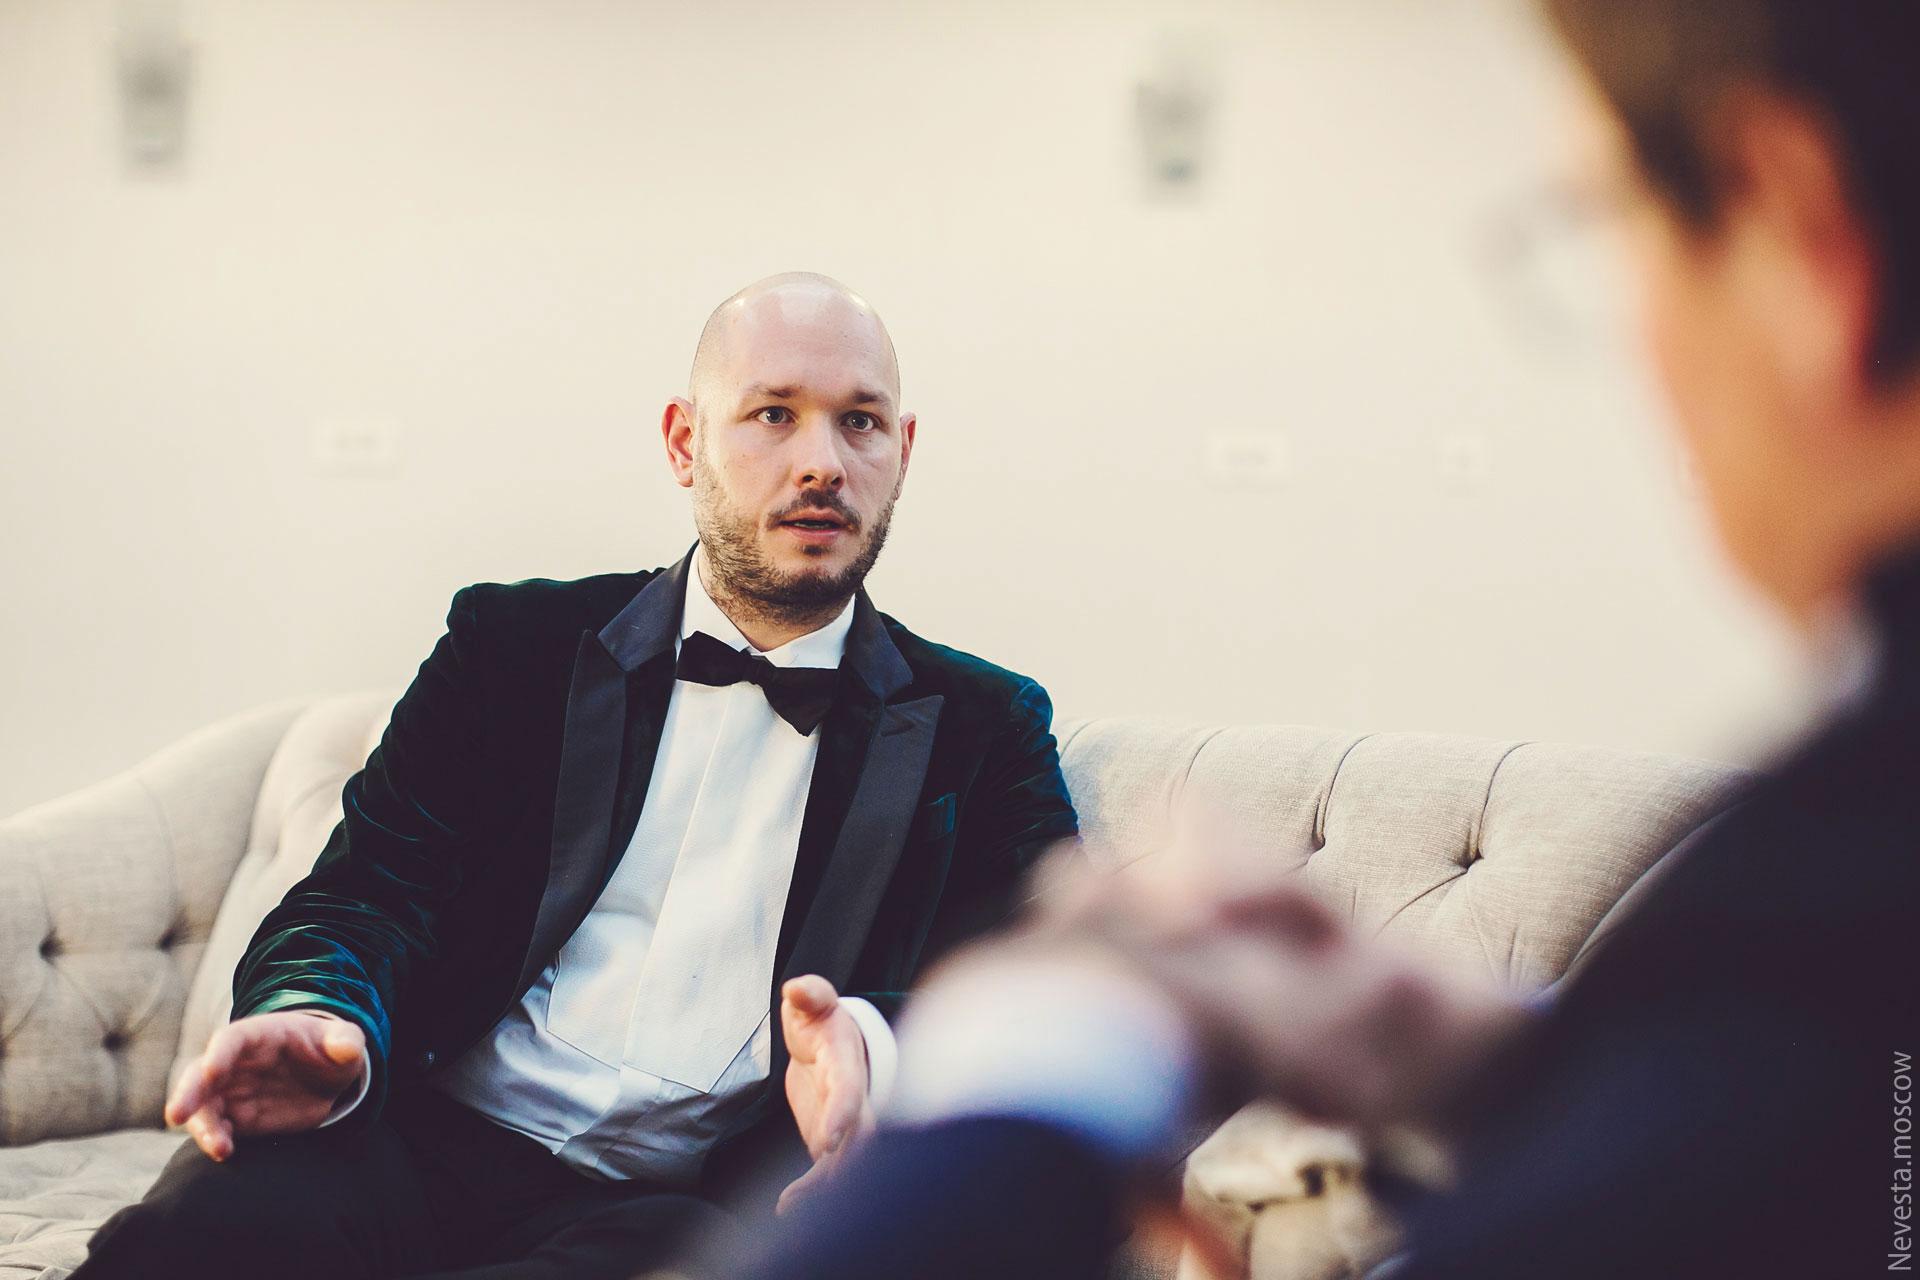 Александр Белов, Свадебное агентство TOBELOVE фото 2